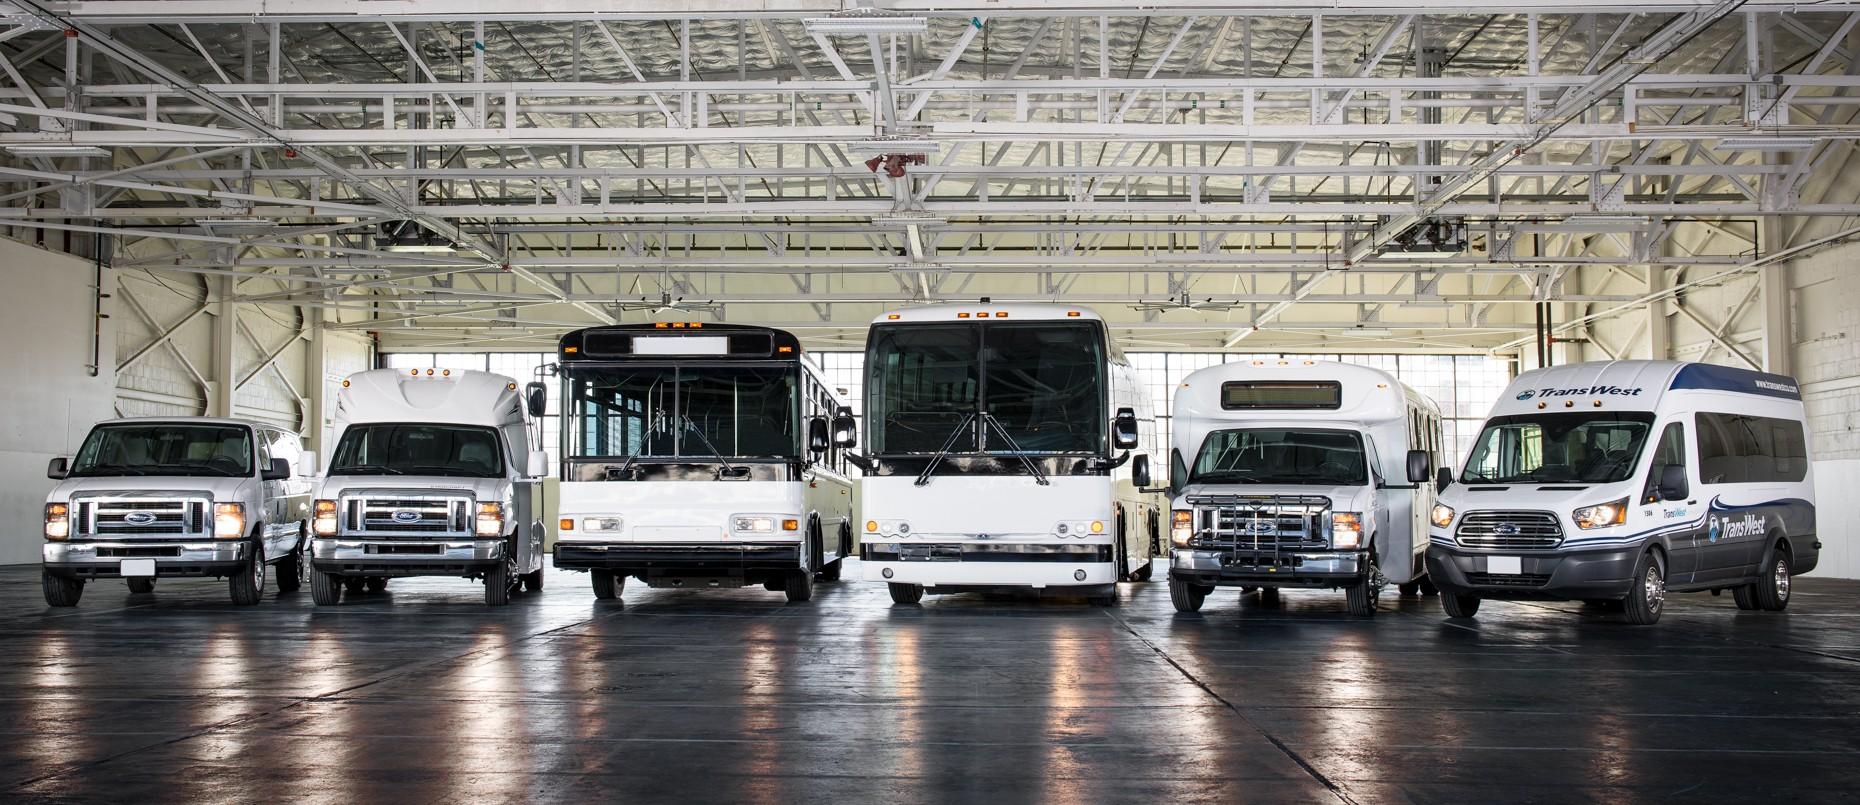 TransWest Transportation | LinkedIn